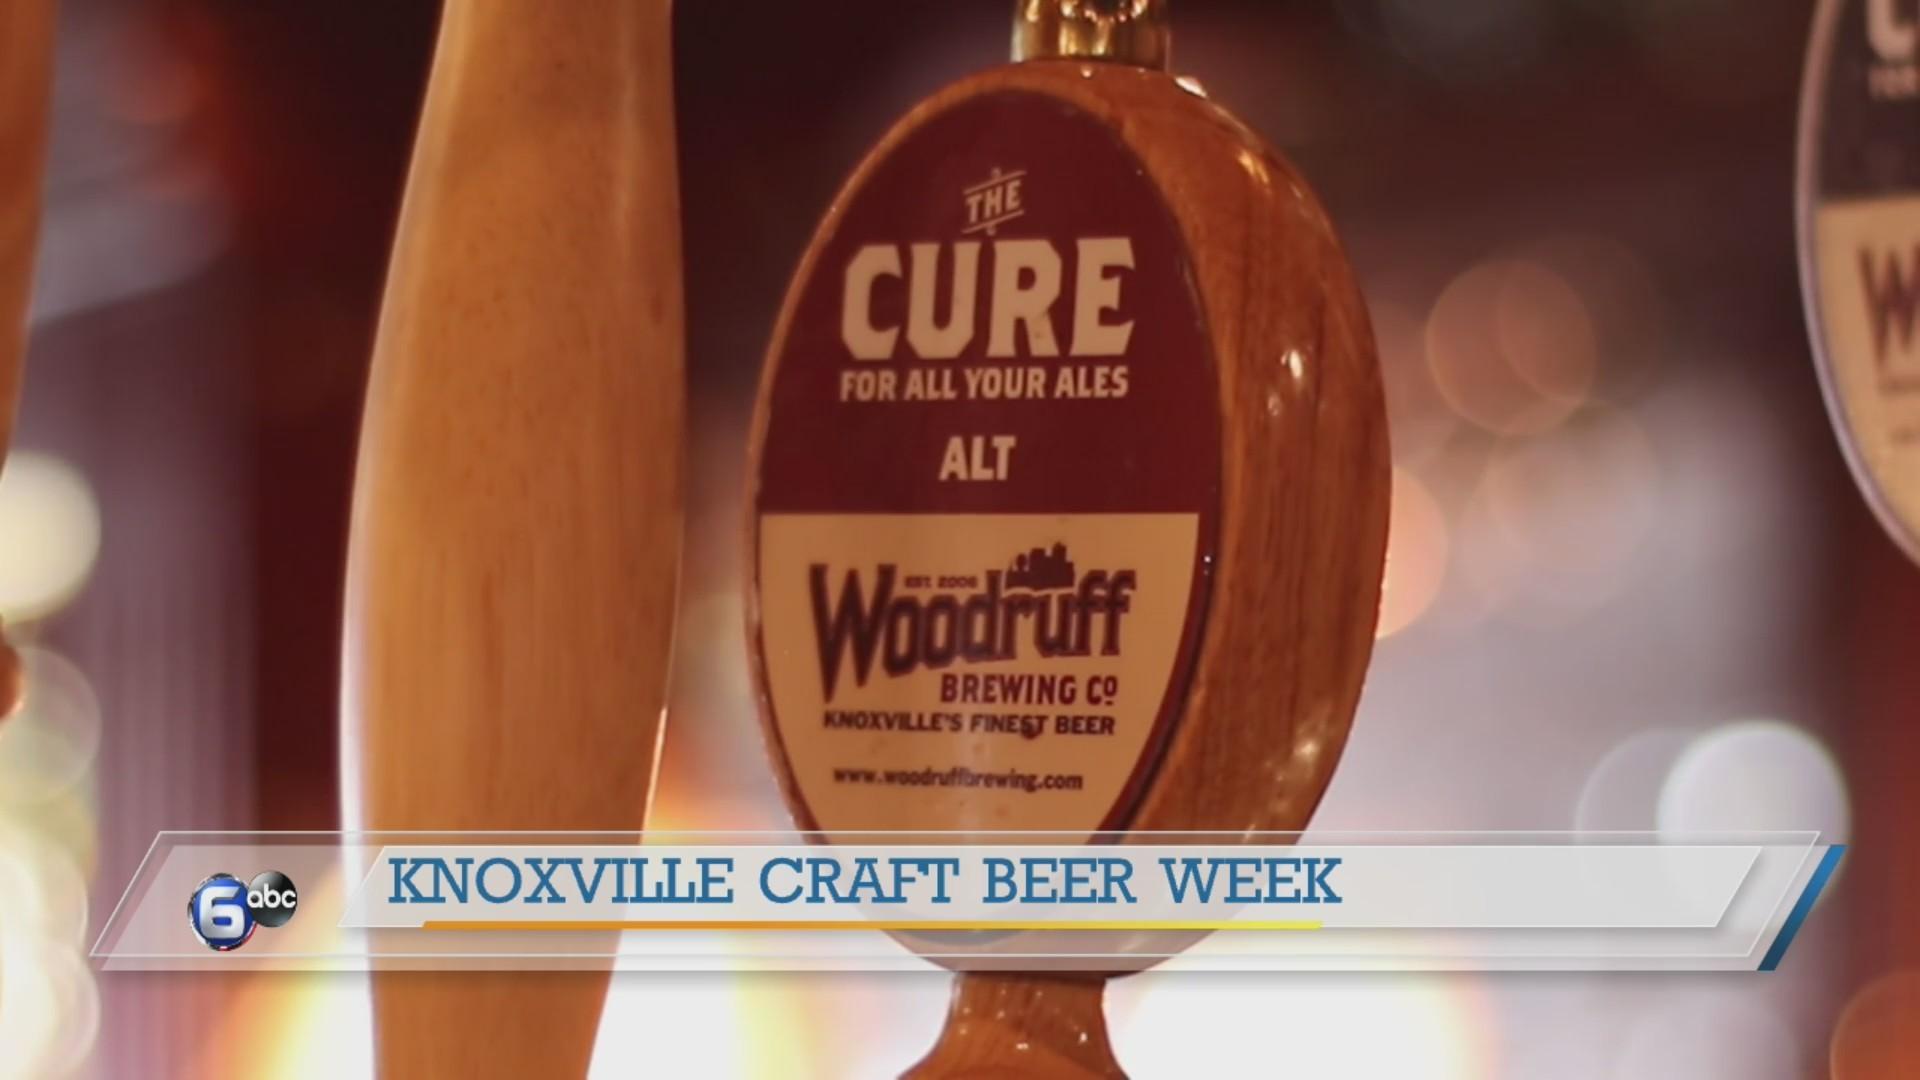 Knoxville Craft Beer Week: Woodruff Brewing